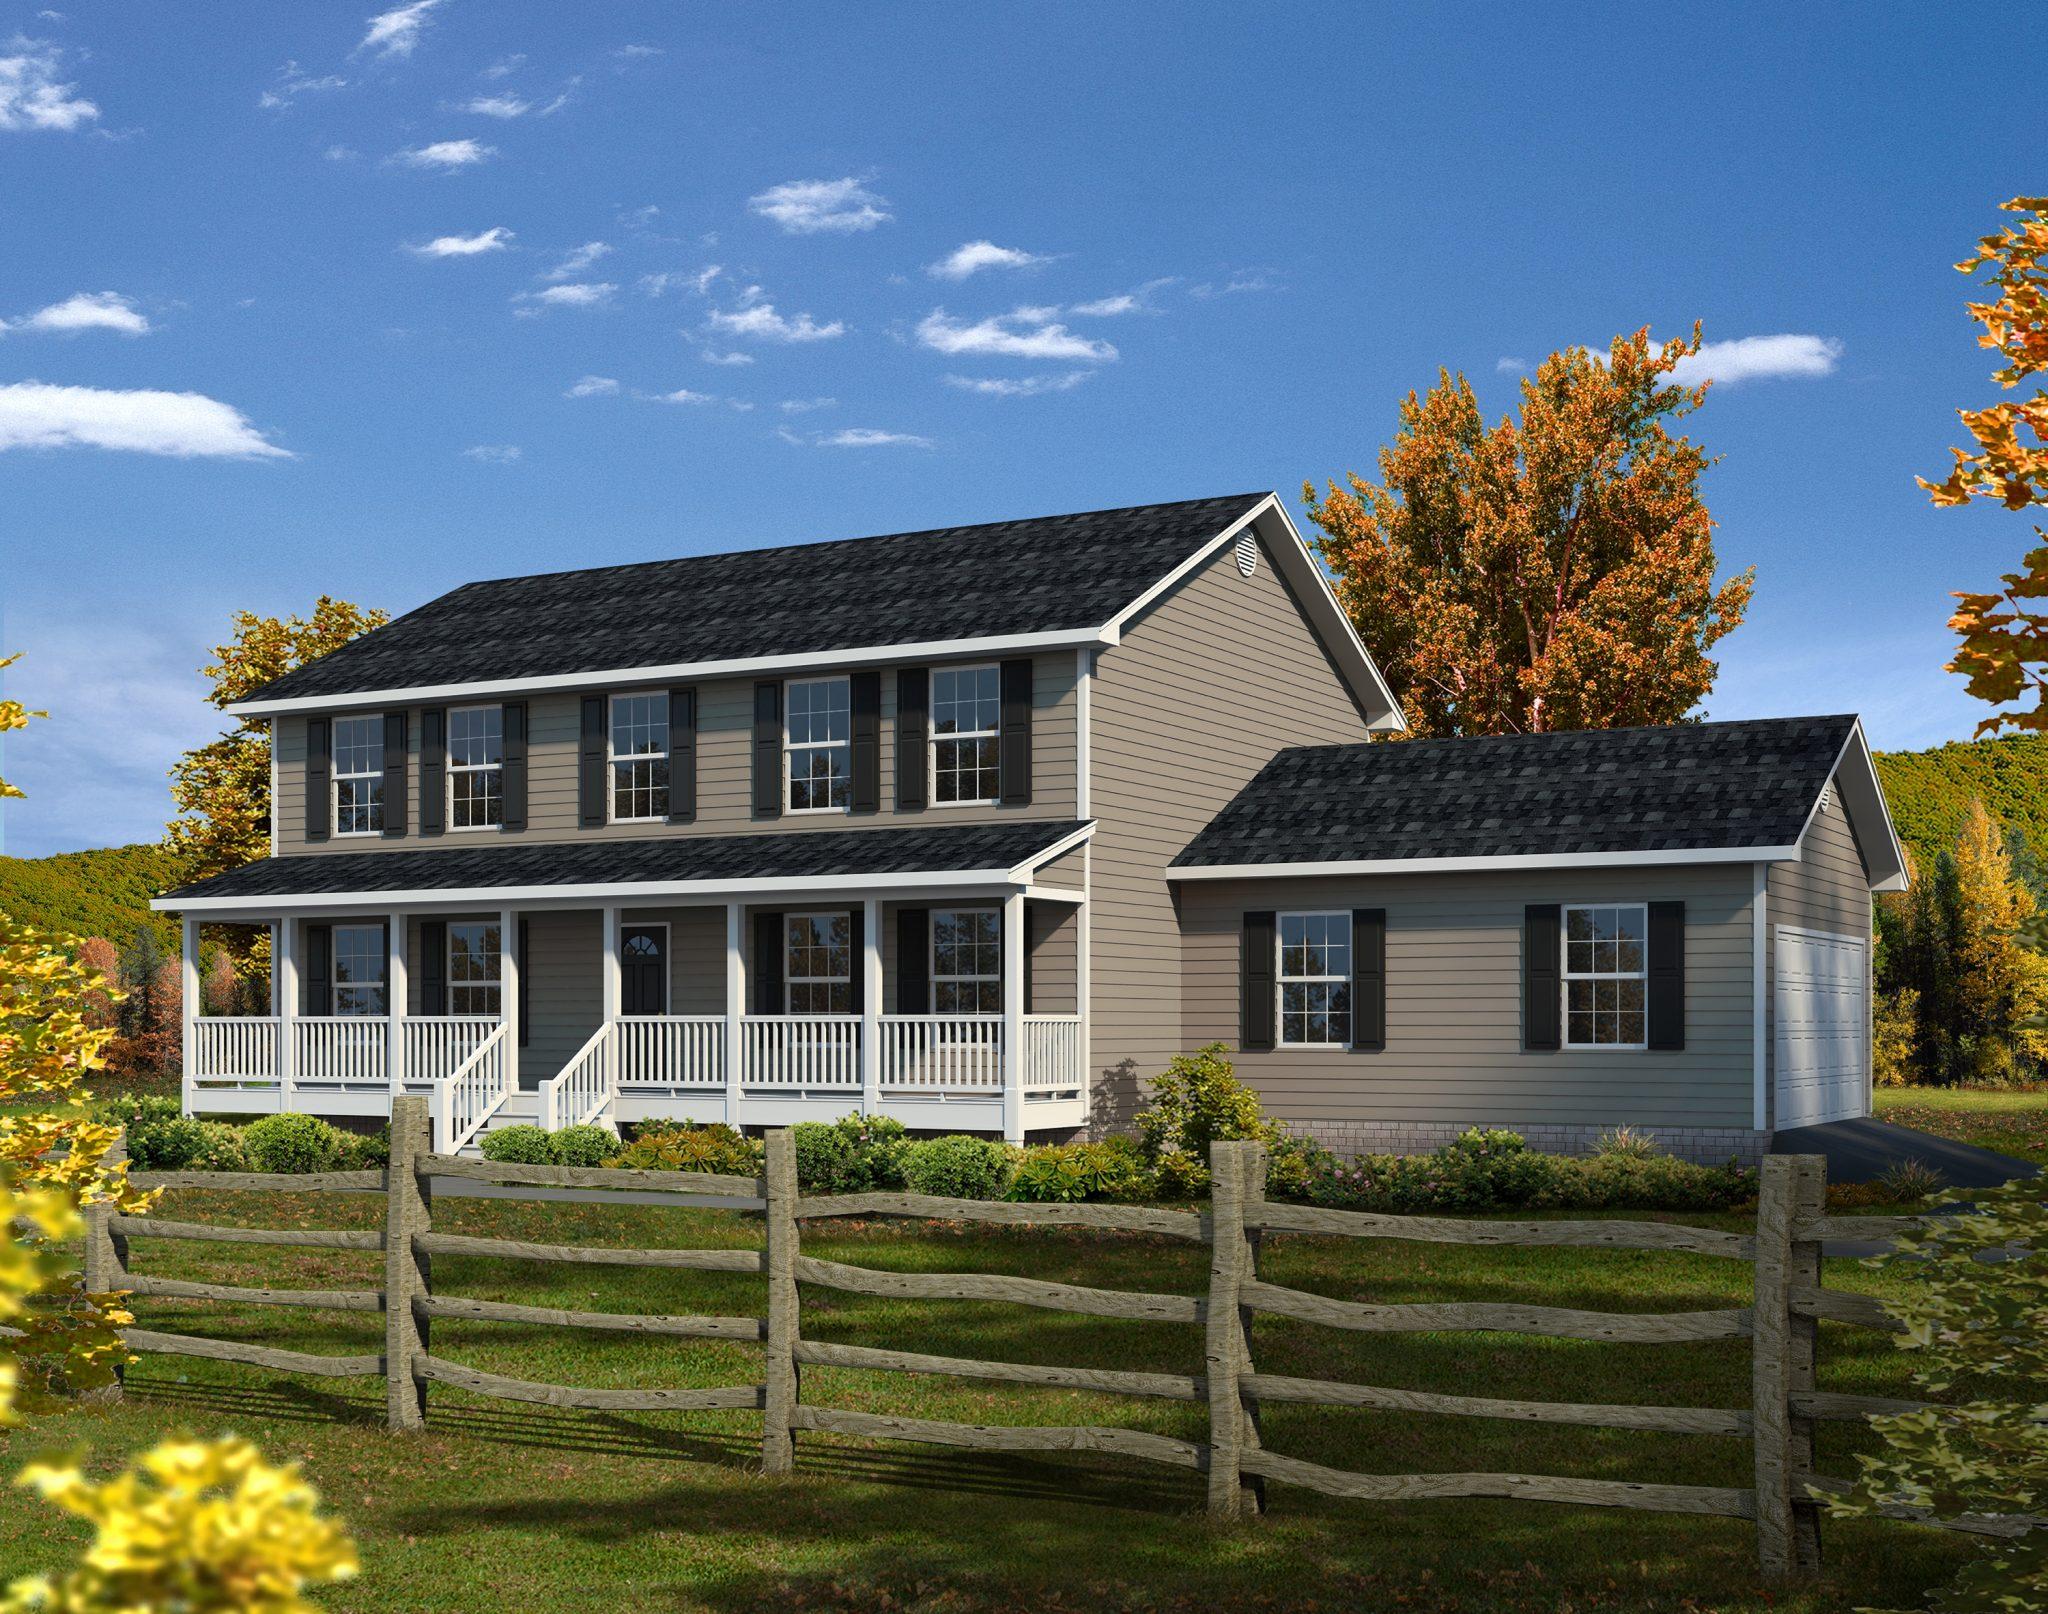 Best Custom Home Builder In San Antonio - Cherokee farmhouse 5